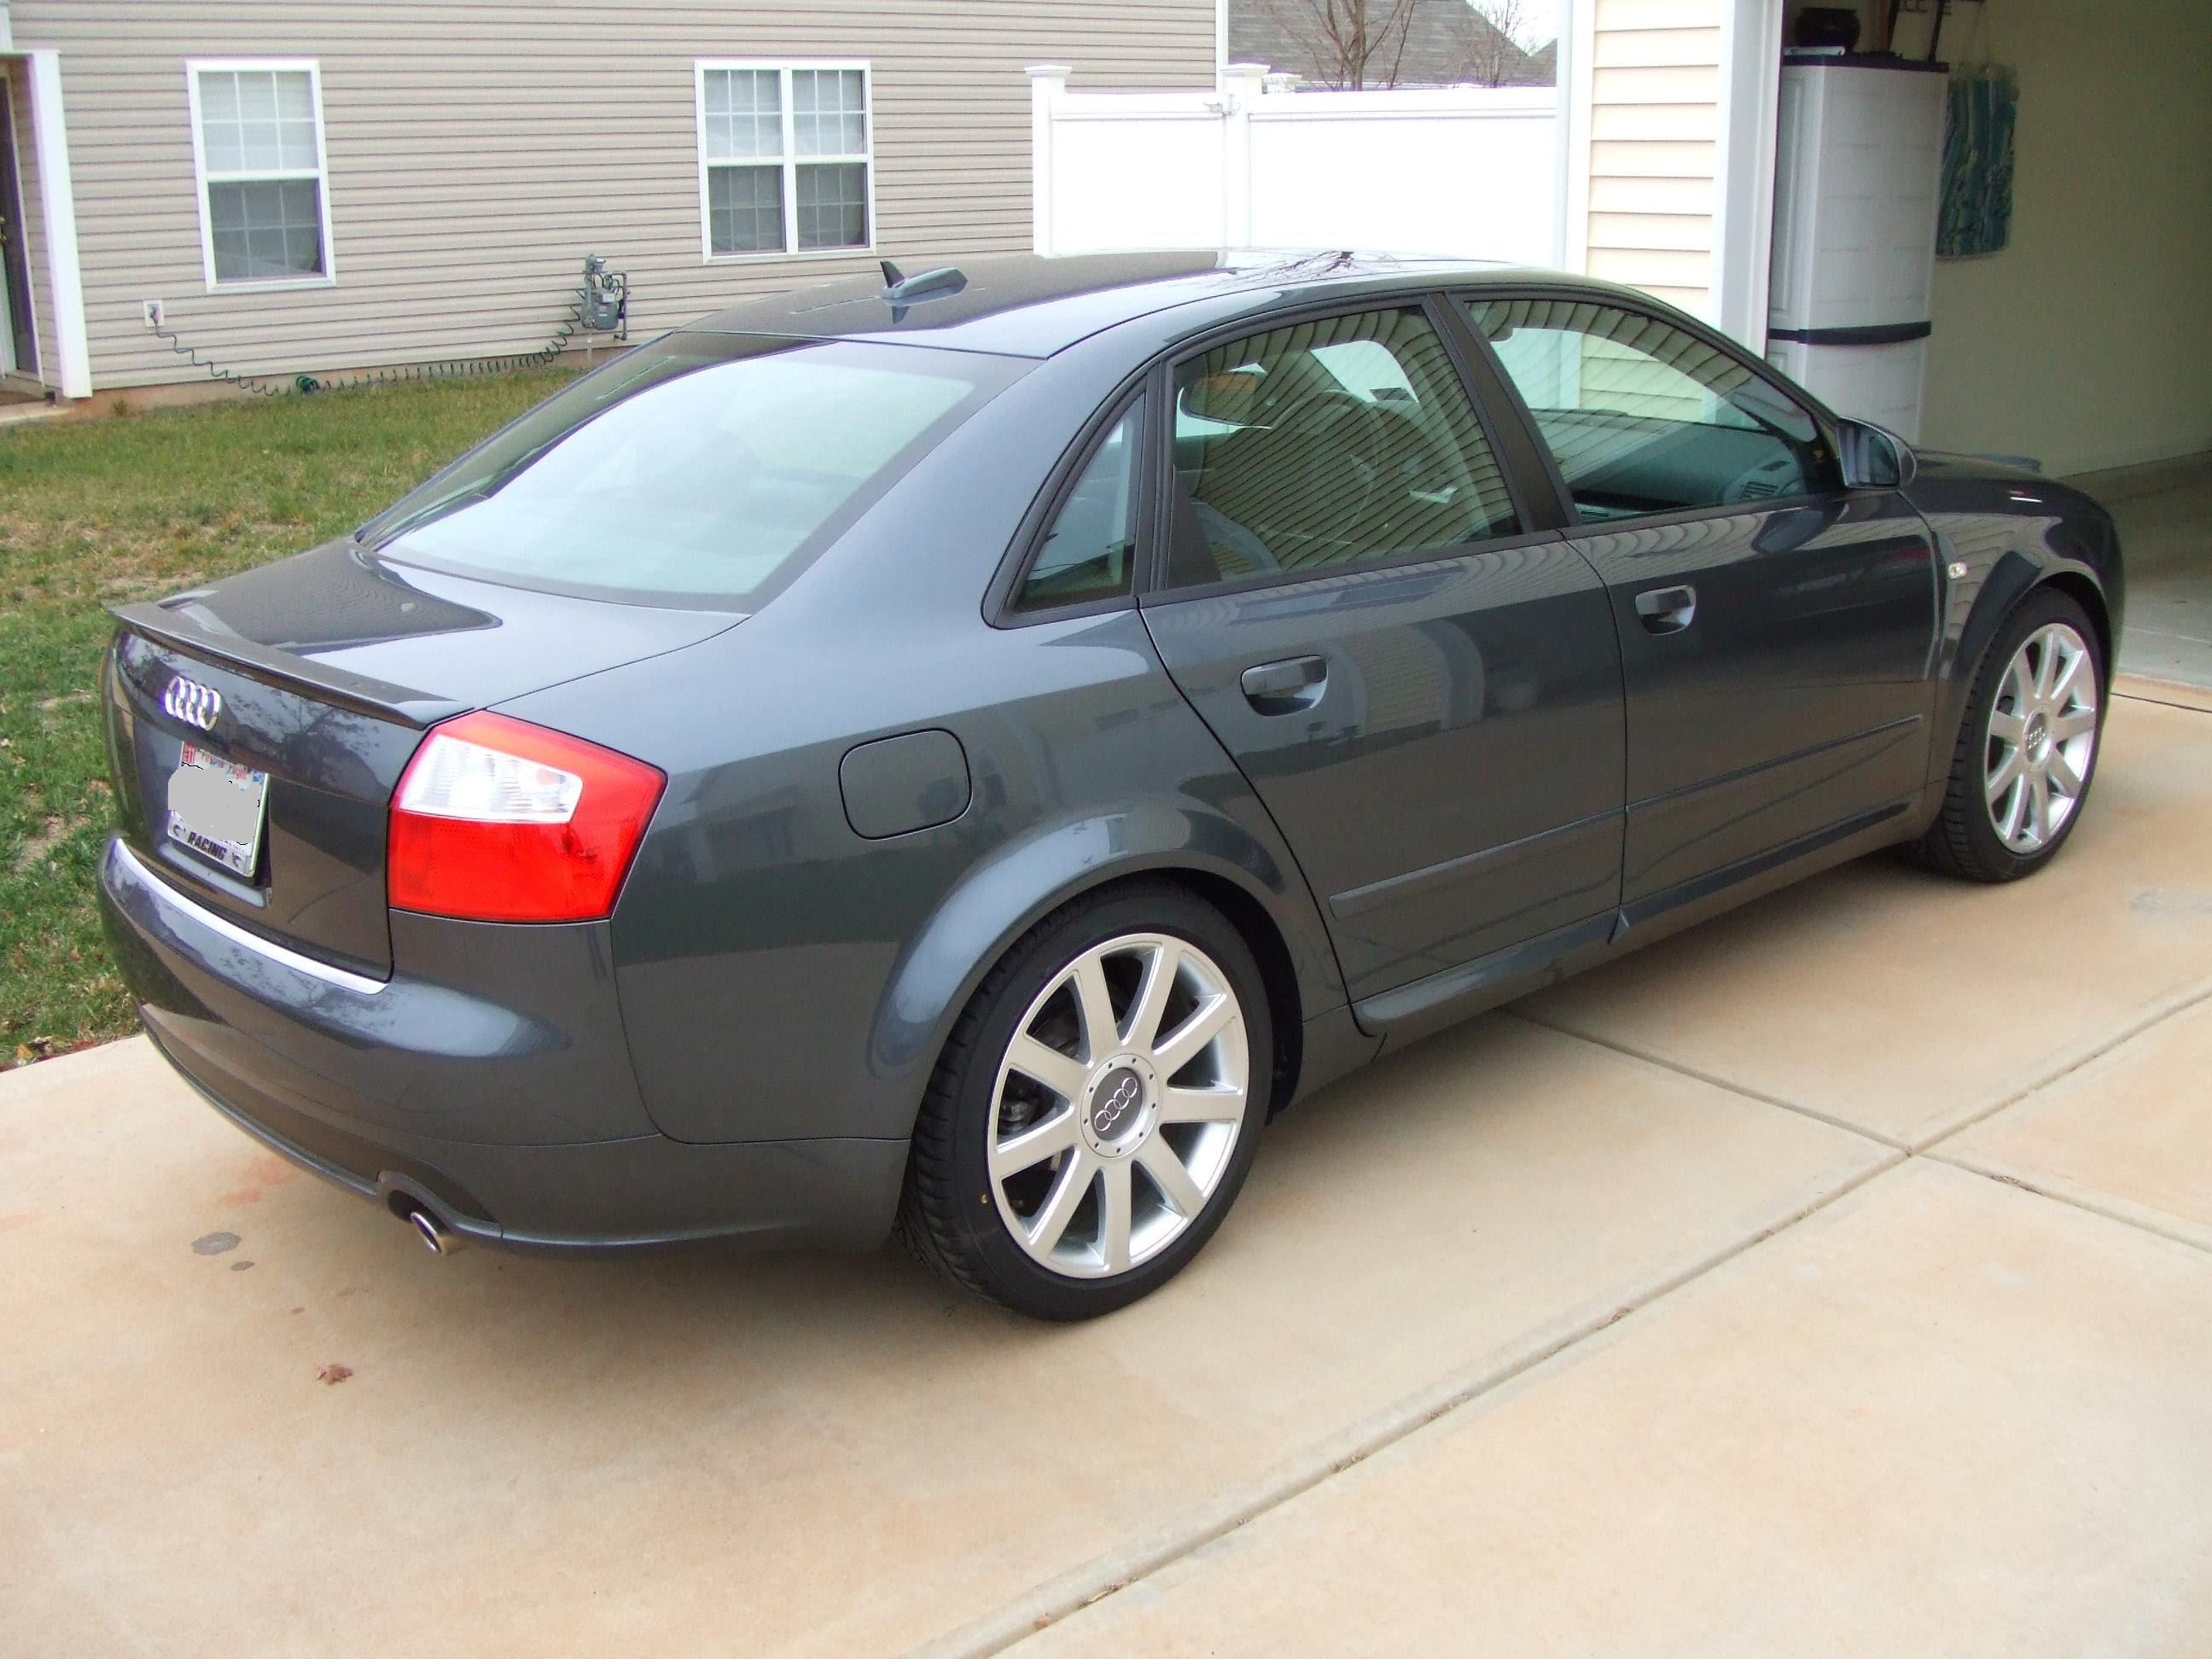 2005 Audi A4 Slammed Audi Car